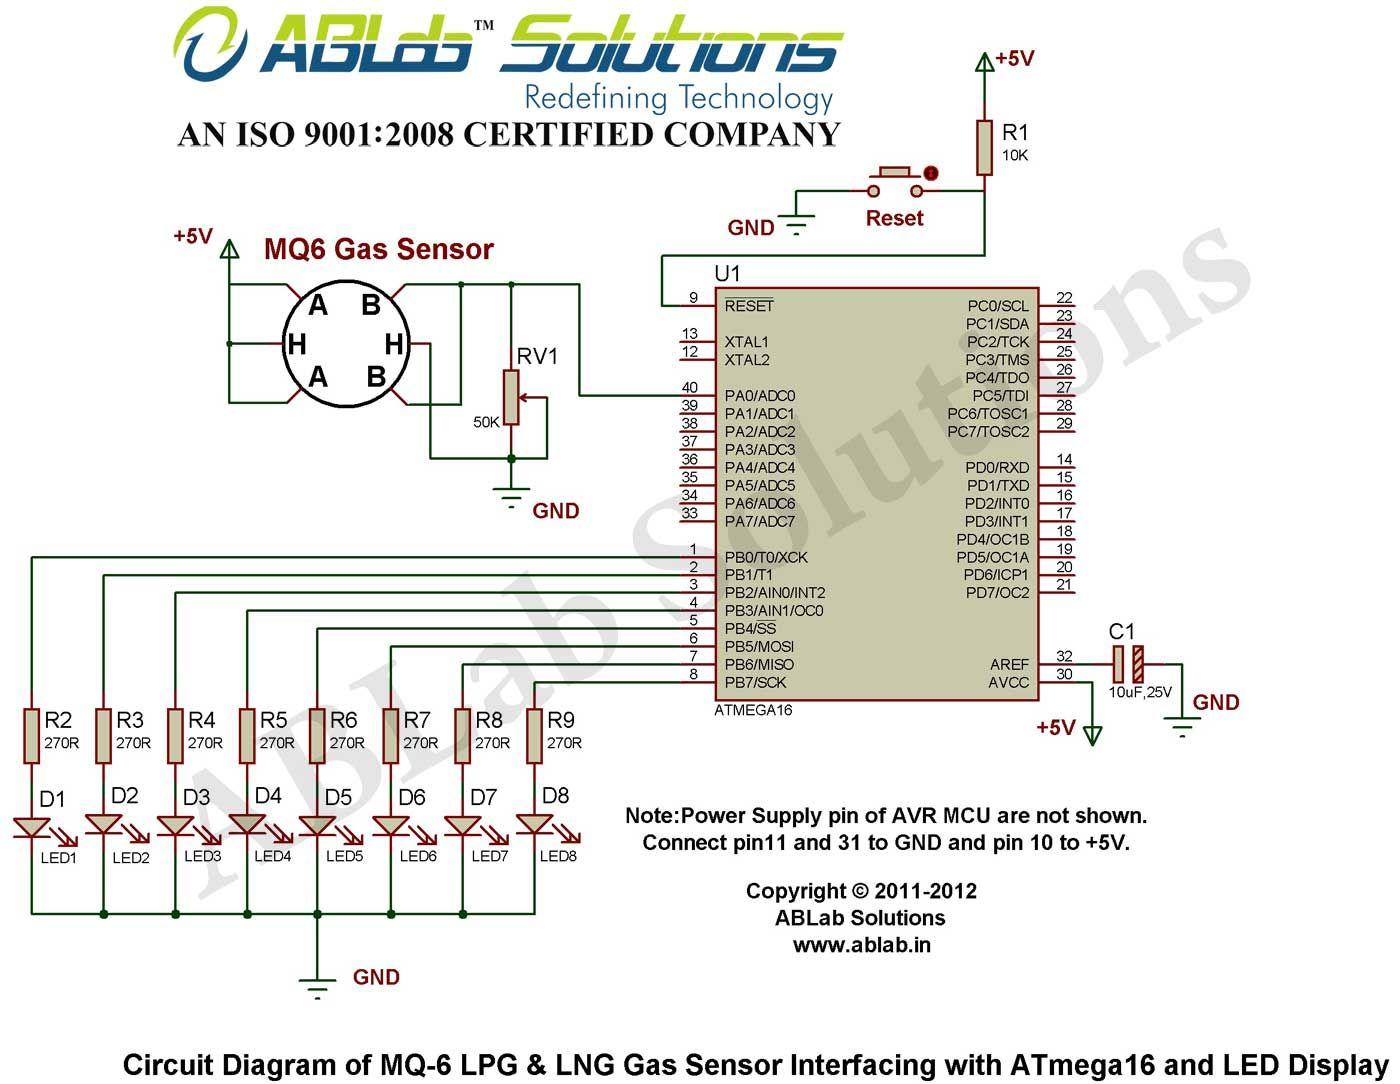 mq 6 lpg lng gas sensor interfacing with avr atmega16 mq 6 circuit diagram [ 1400 x 1084 Pixel ]